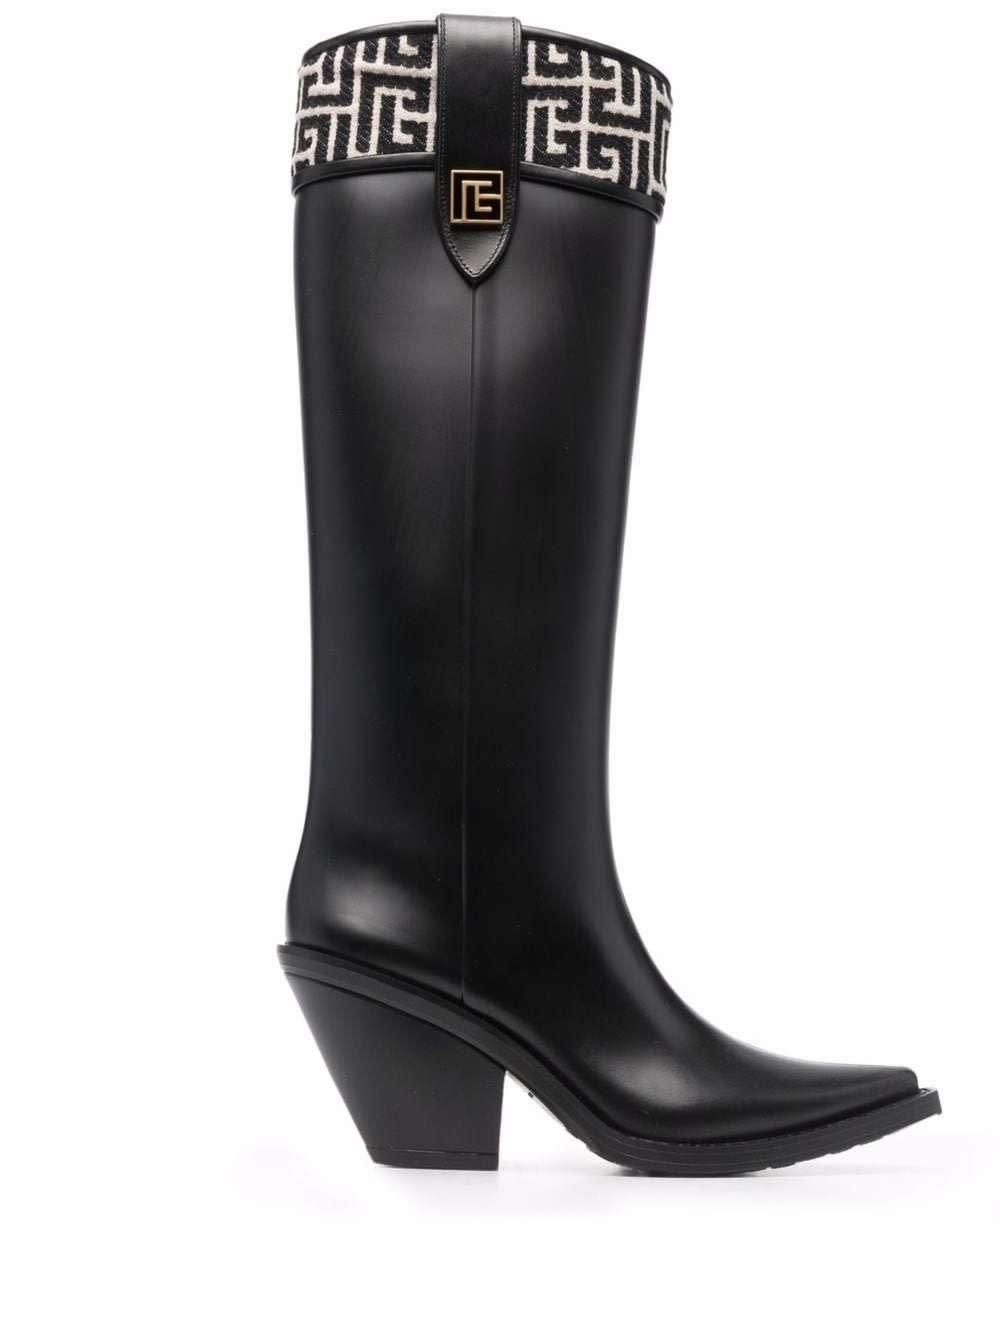 Balmain Black Rubber Tess Boots